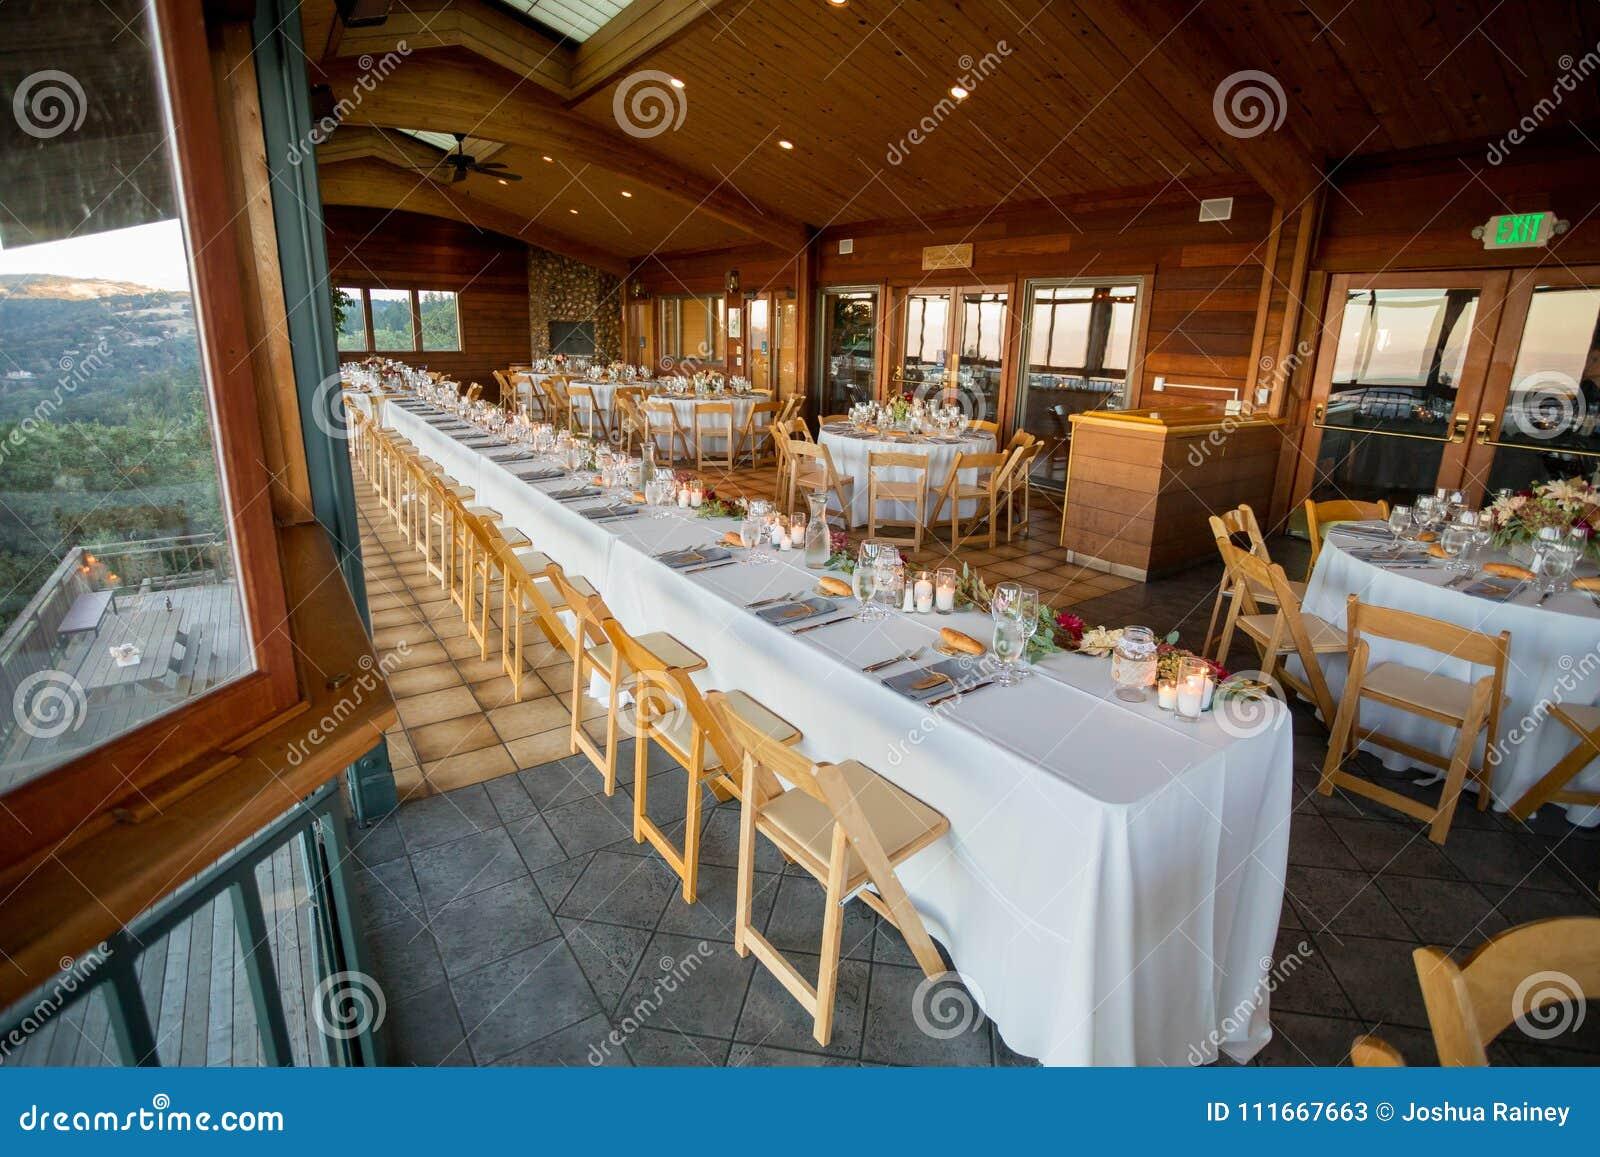 Wedding Reception Table At Winery Wedding Stock Image - Image of ...